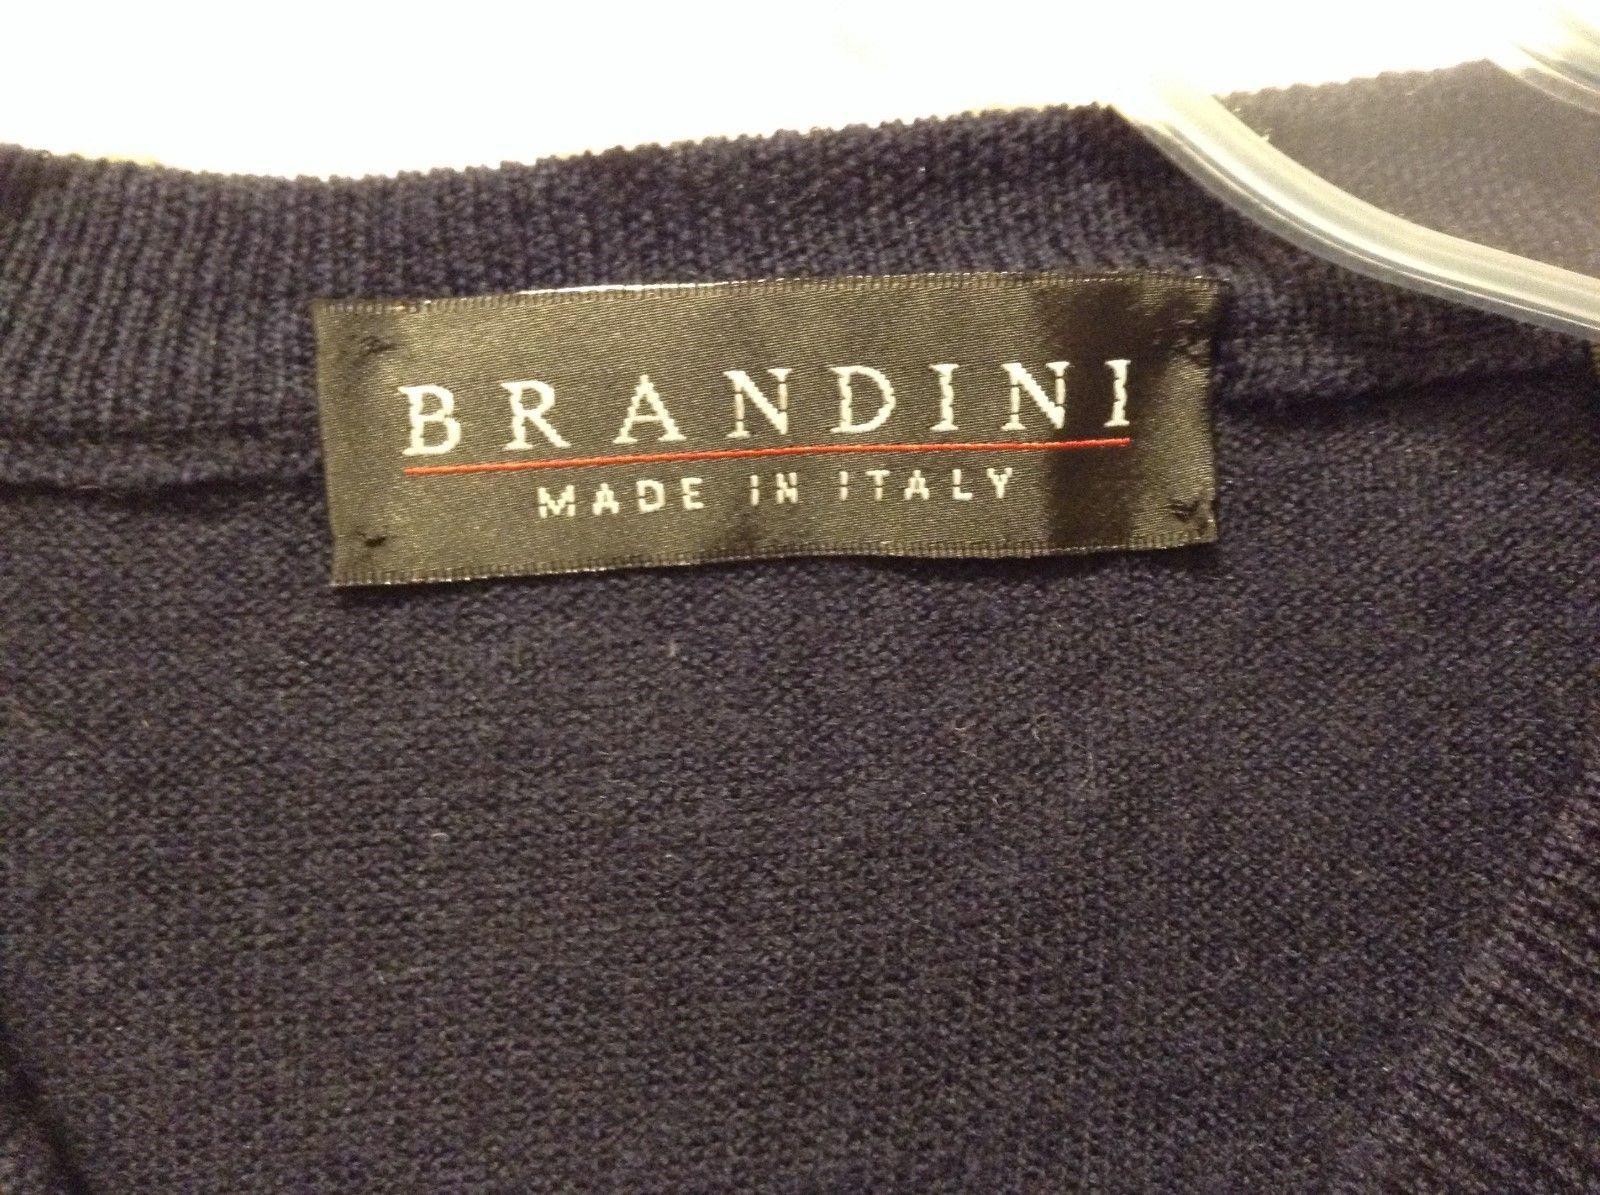 Brandini Pure New Wool Navy Blue Sweatervest Sz Medium